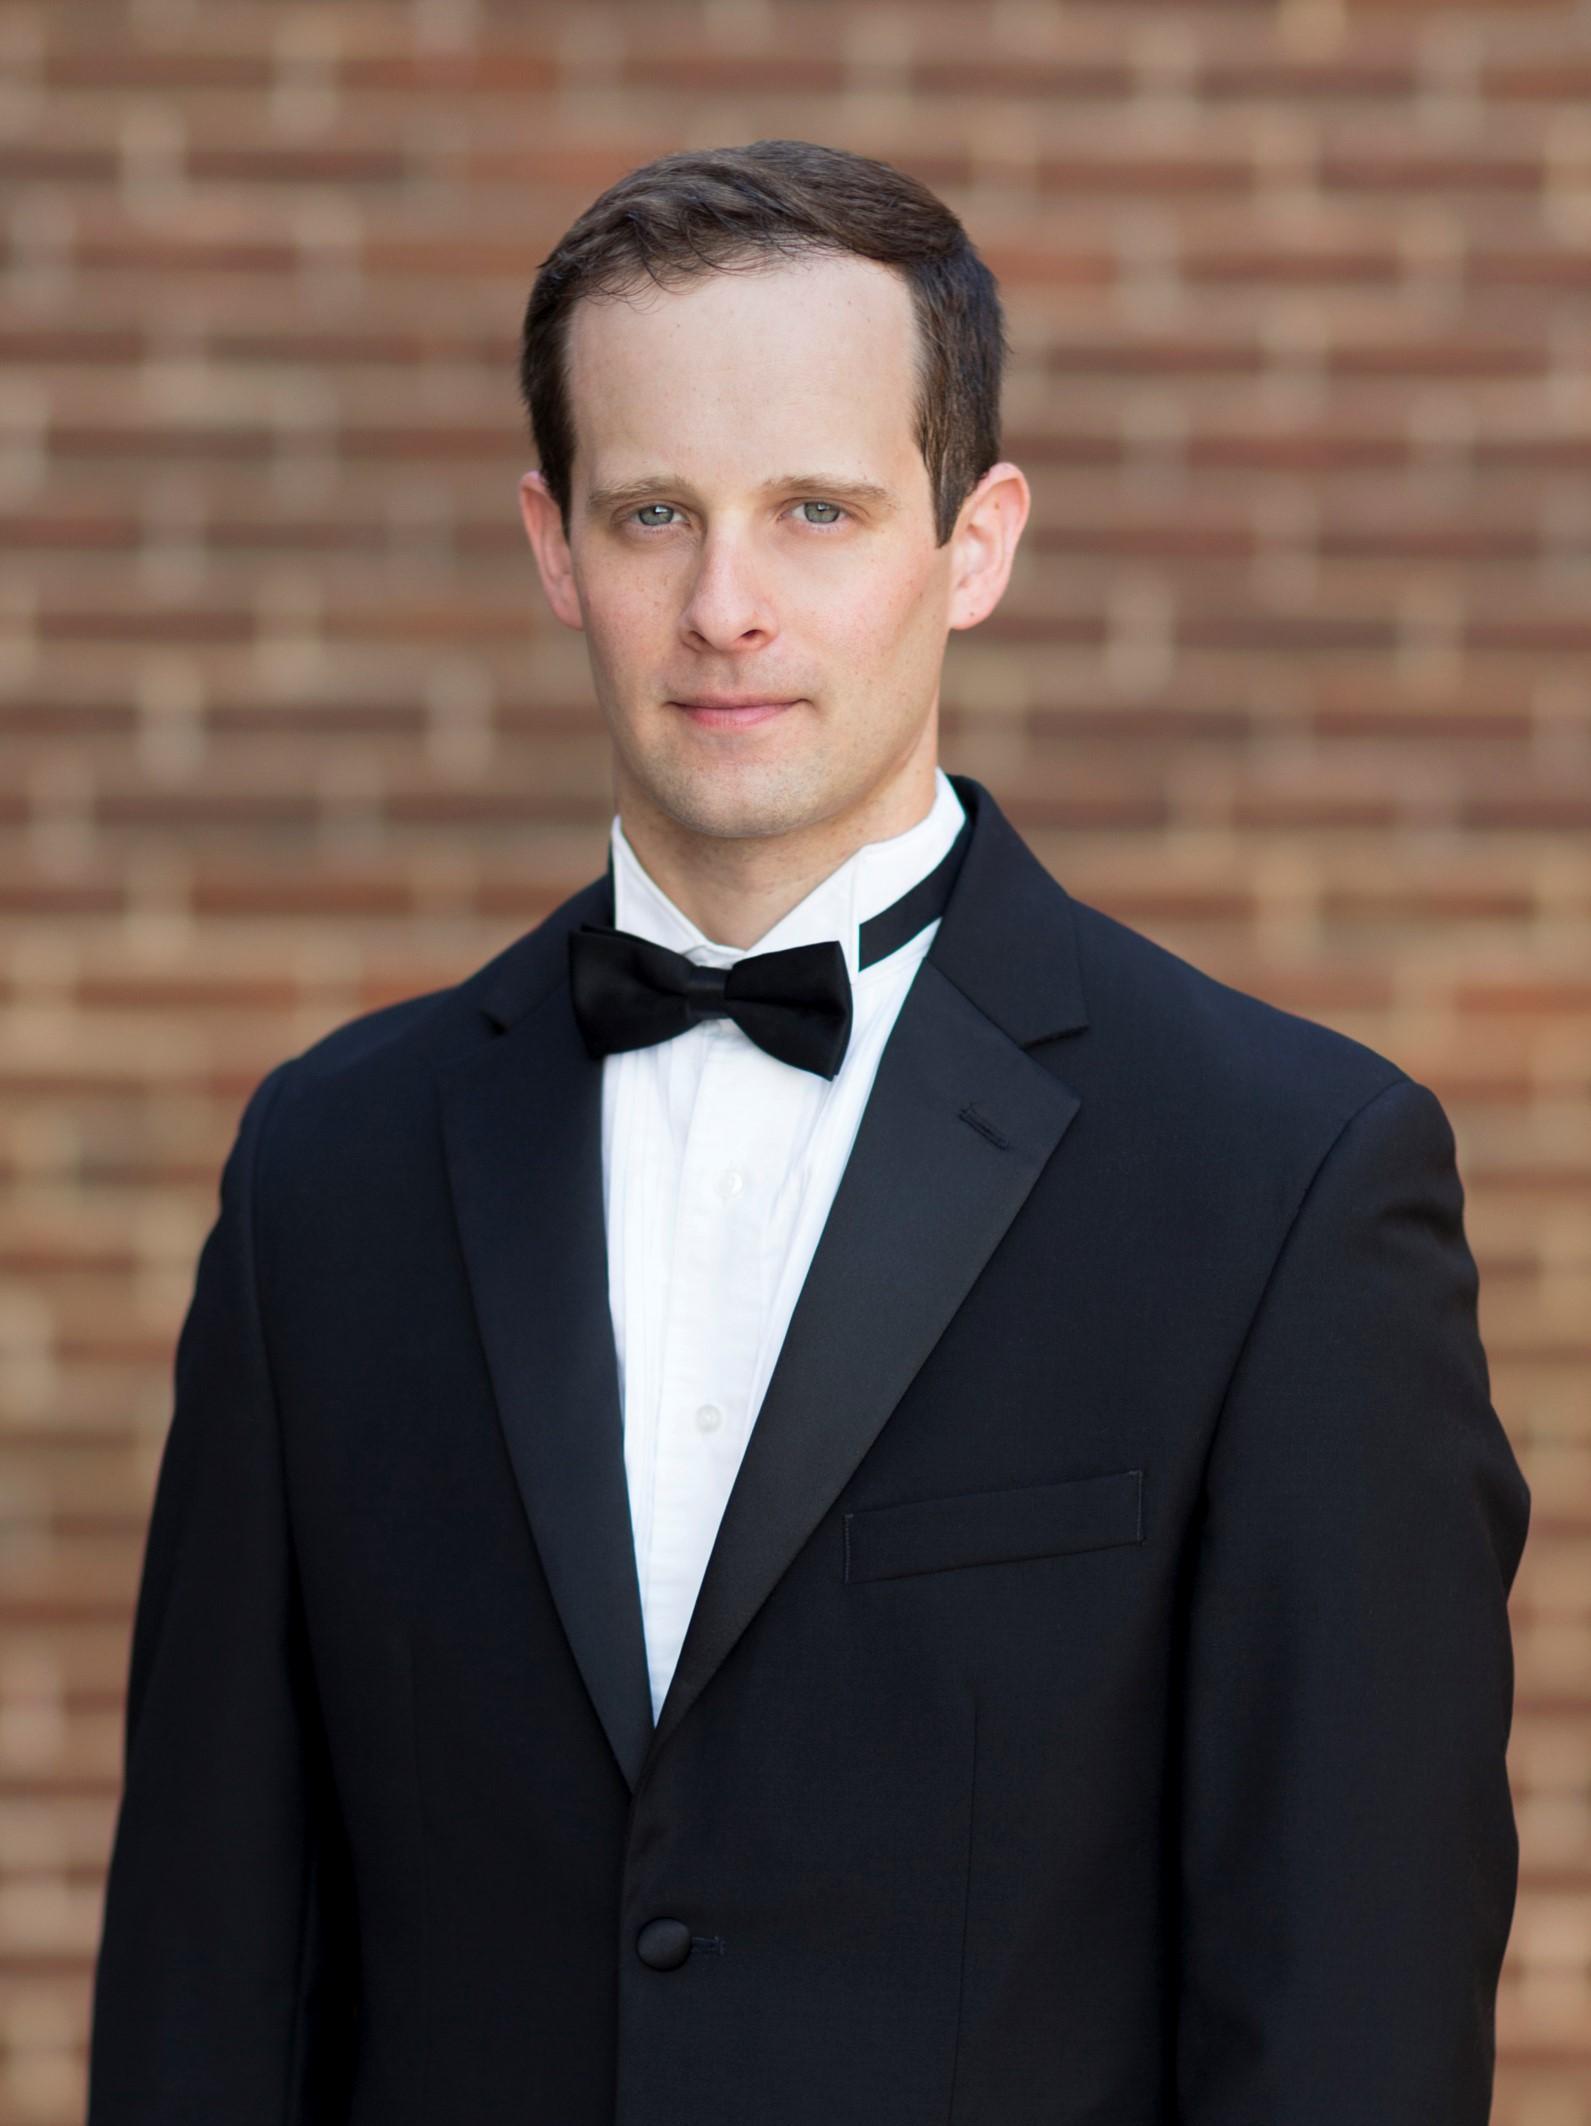 James Woomert - Atholton High School                  Howard County